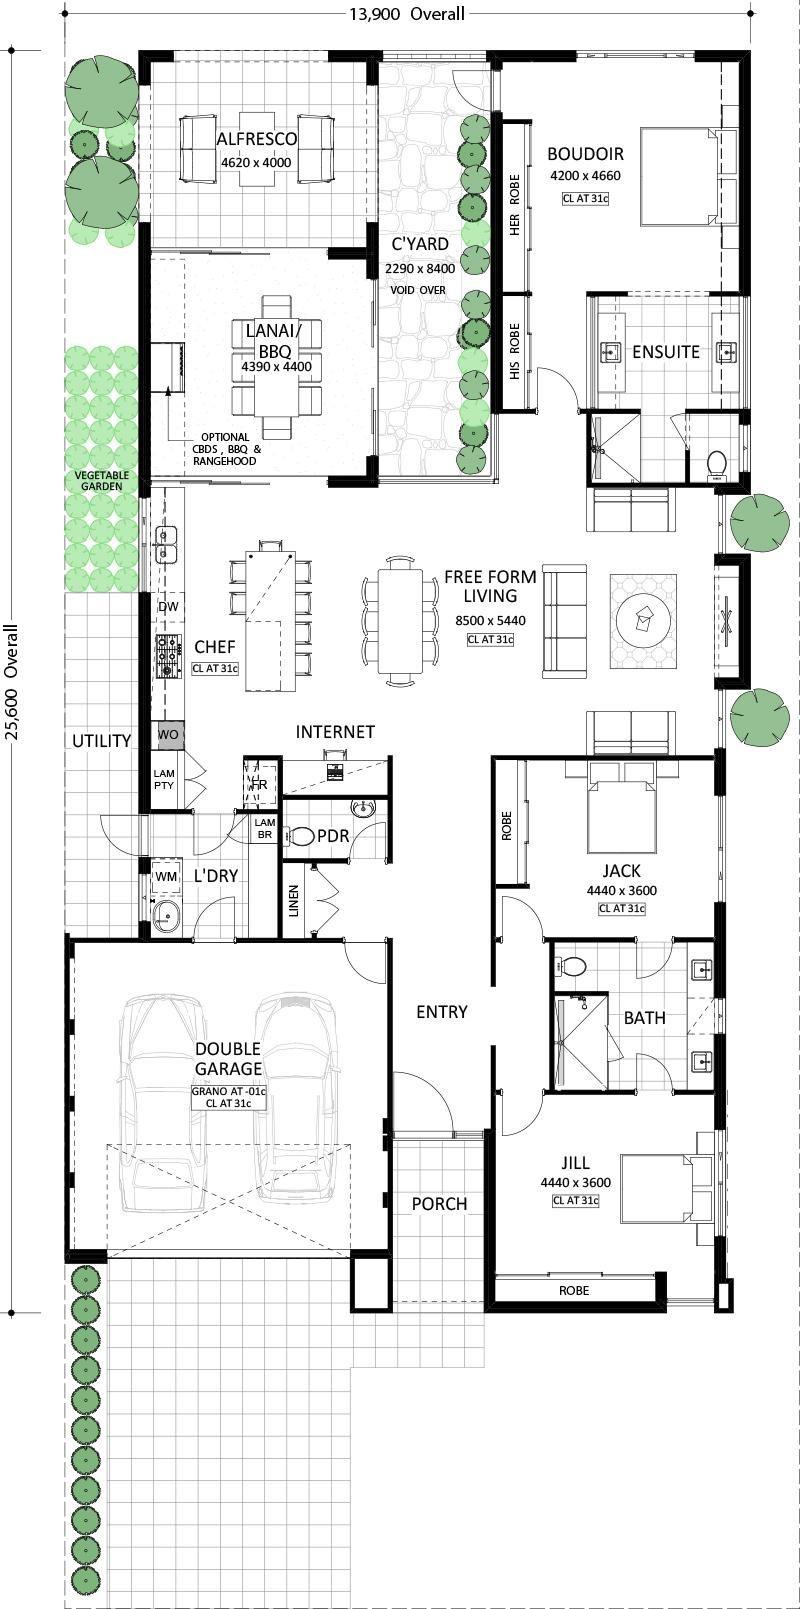 Yuma Residential Attitudes House Plans Australia Beautiful House Plans Courtyard House Plans